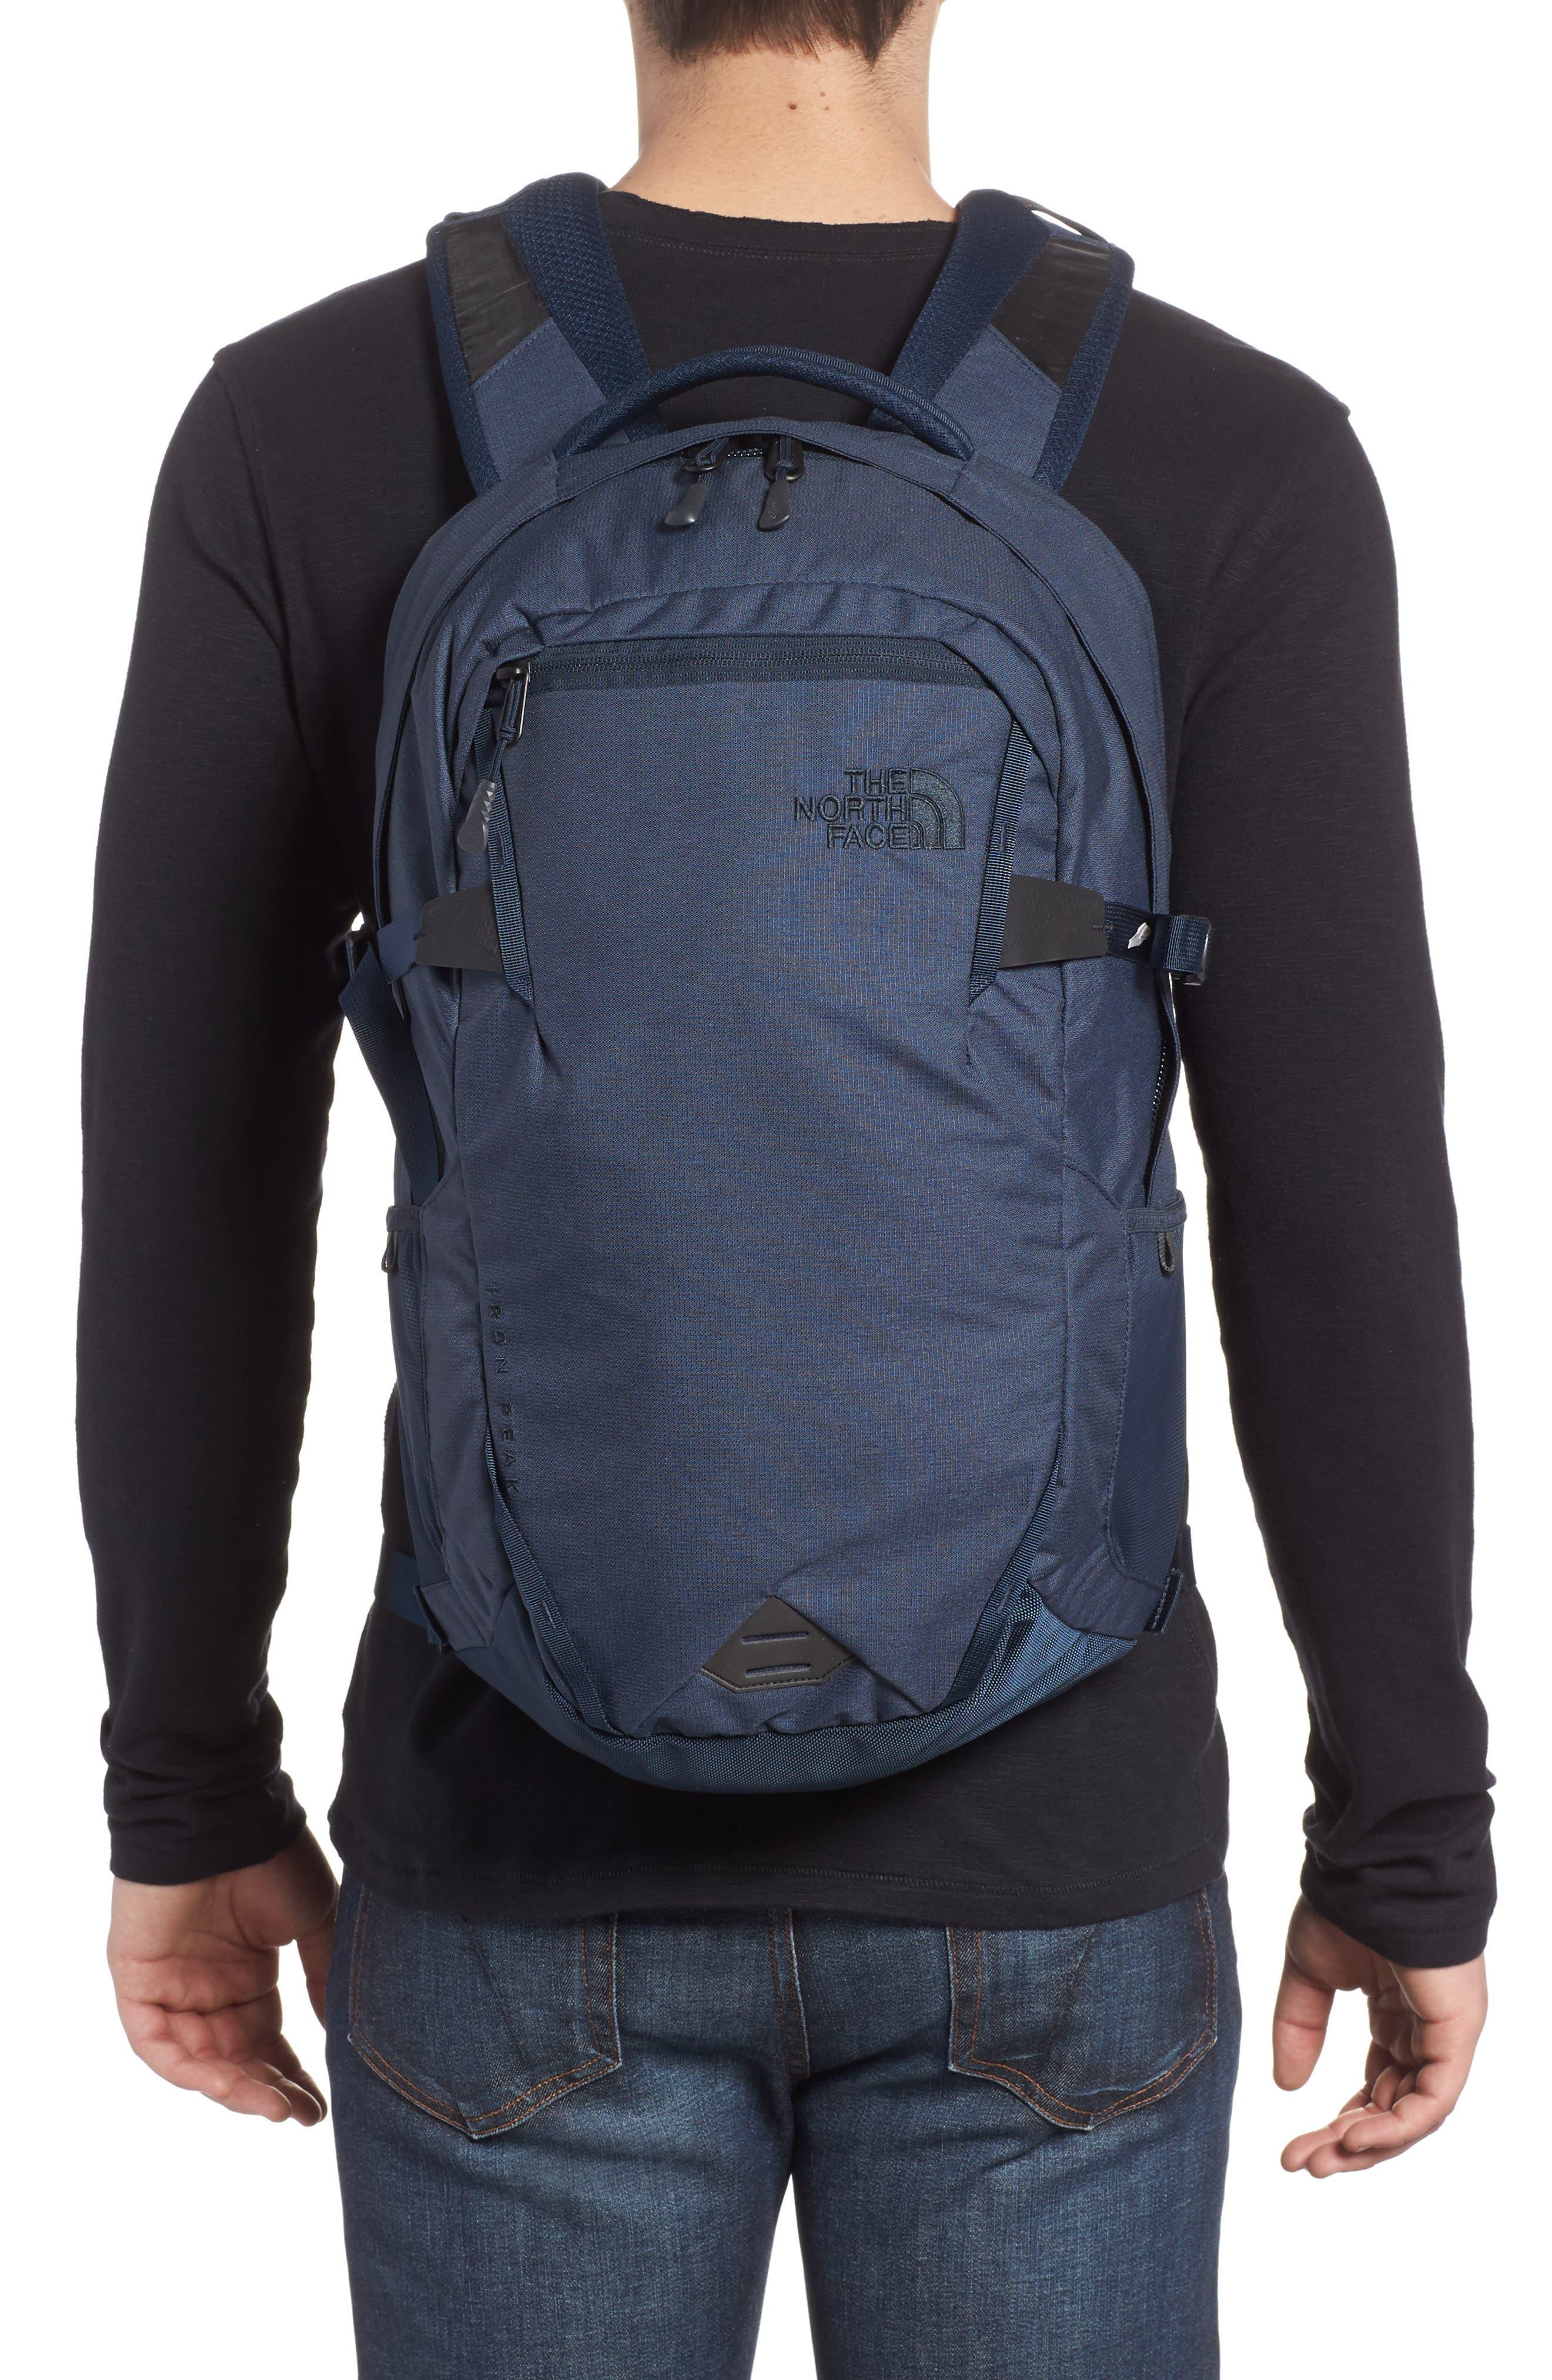 Iron Peak Backpack,                             Alternate thumbnail 7, color,